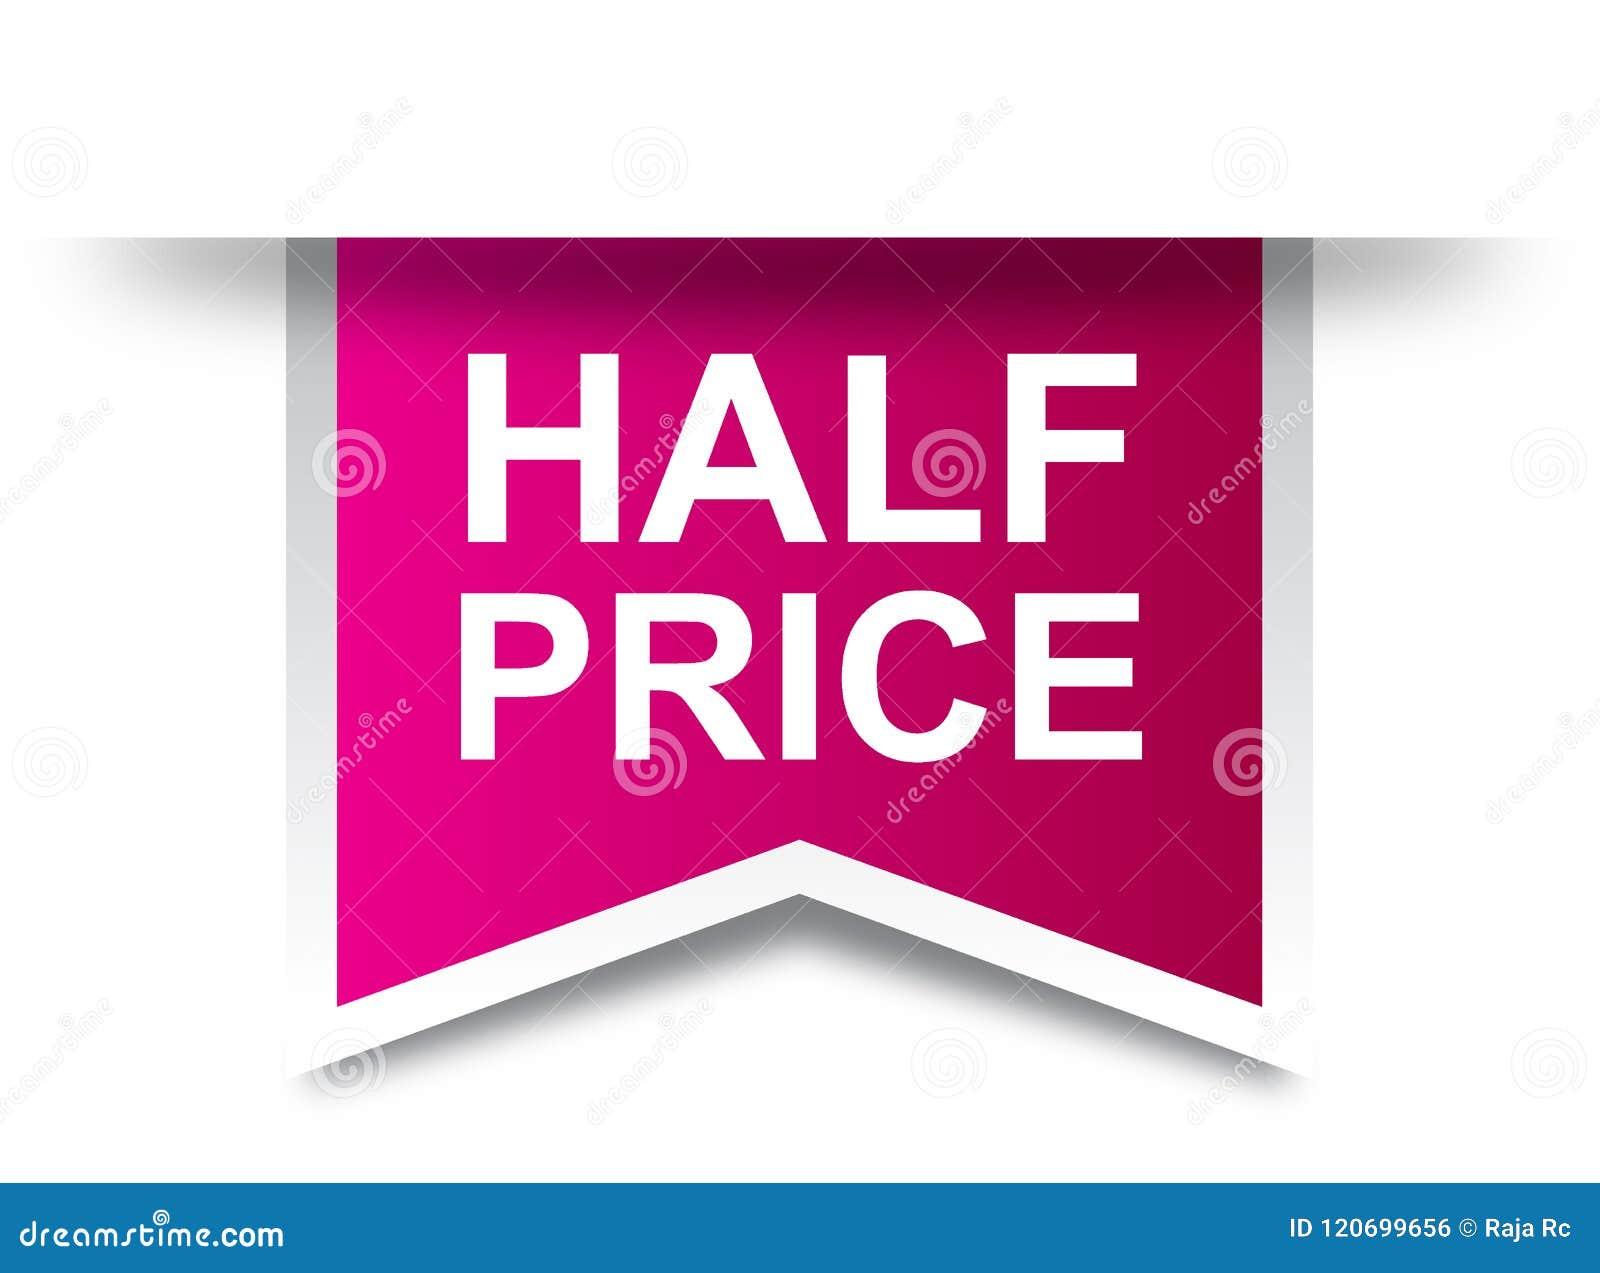 Half price tag label pink